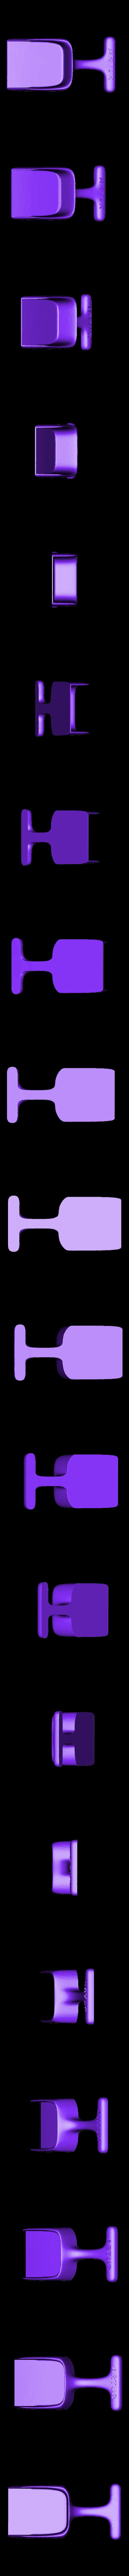 copy_of_opatka_2.stl Download free STL file Tactile discs game (series 2) • Model to 3D print, Ogrod3d